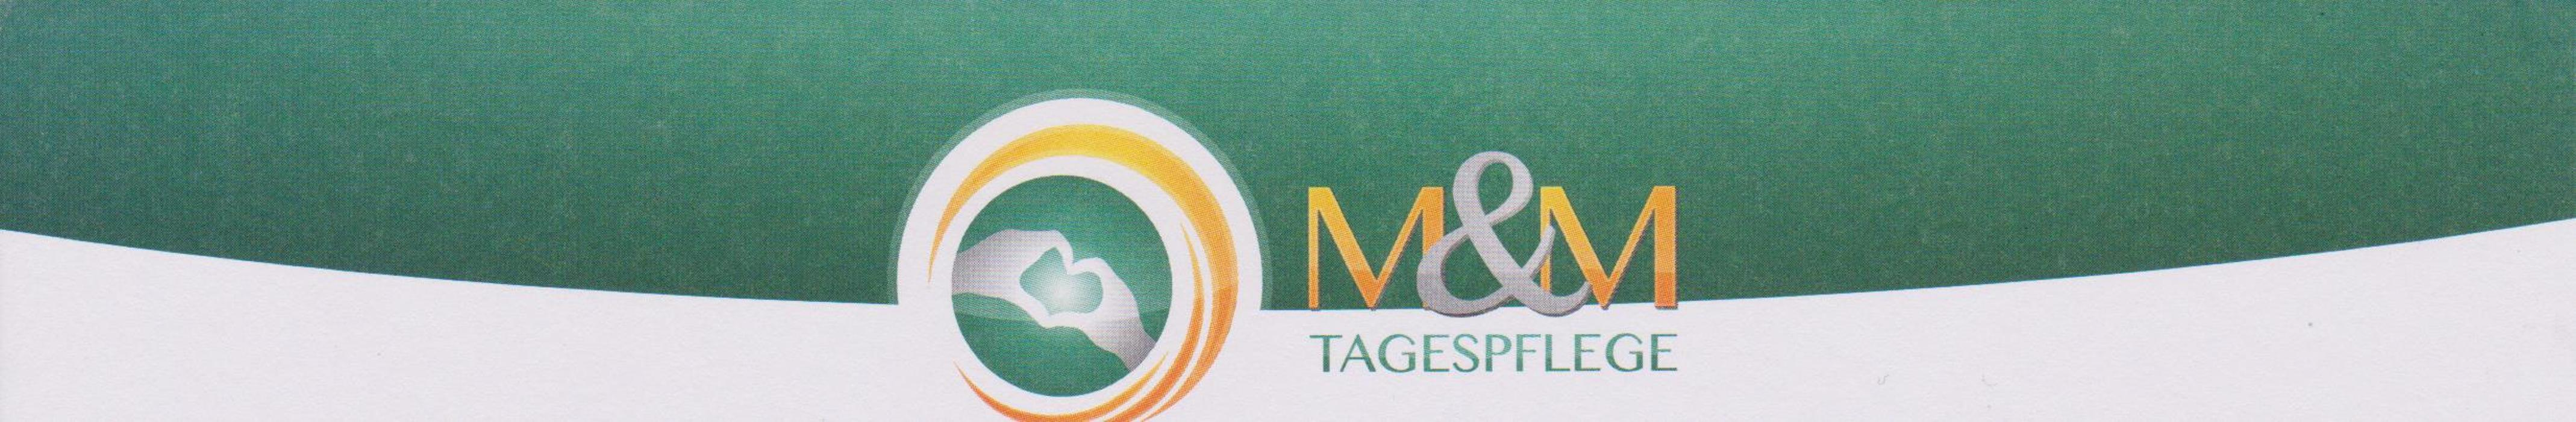 Bild zu M&M Tagespflege Barsinghausen in Barsinghausen